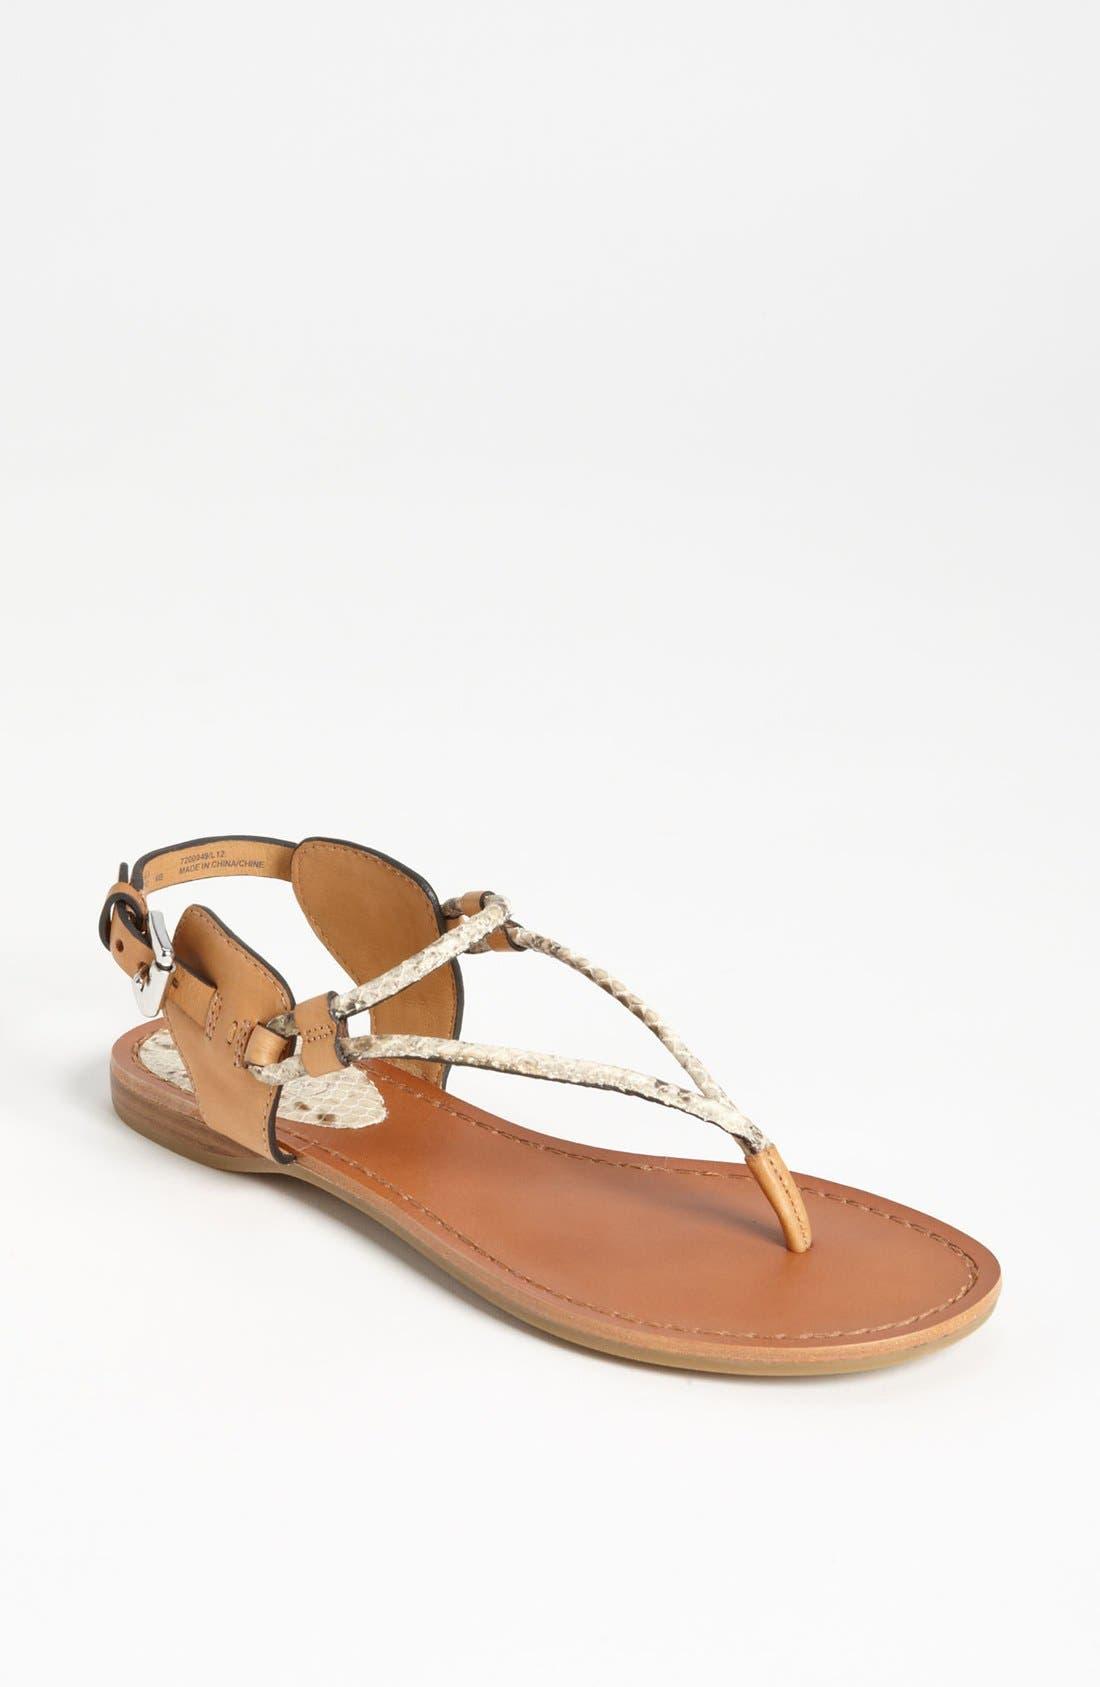 Main Image - COACH 'Coco' Sandal